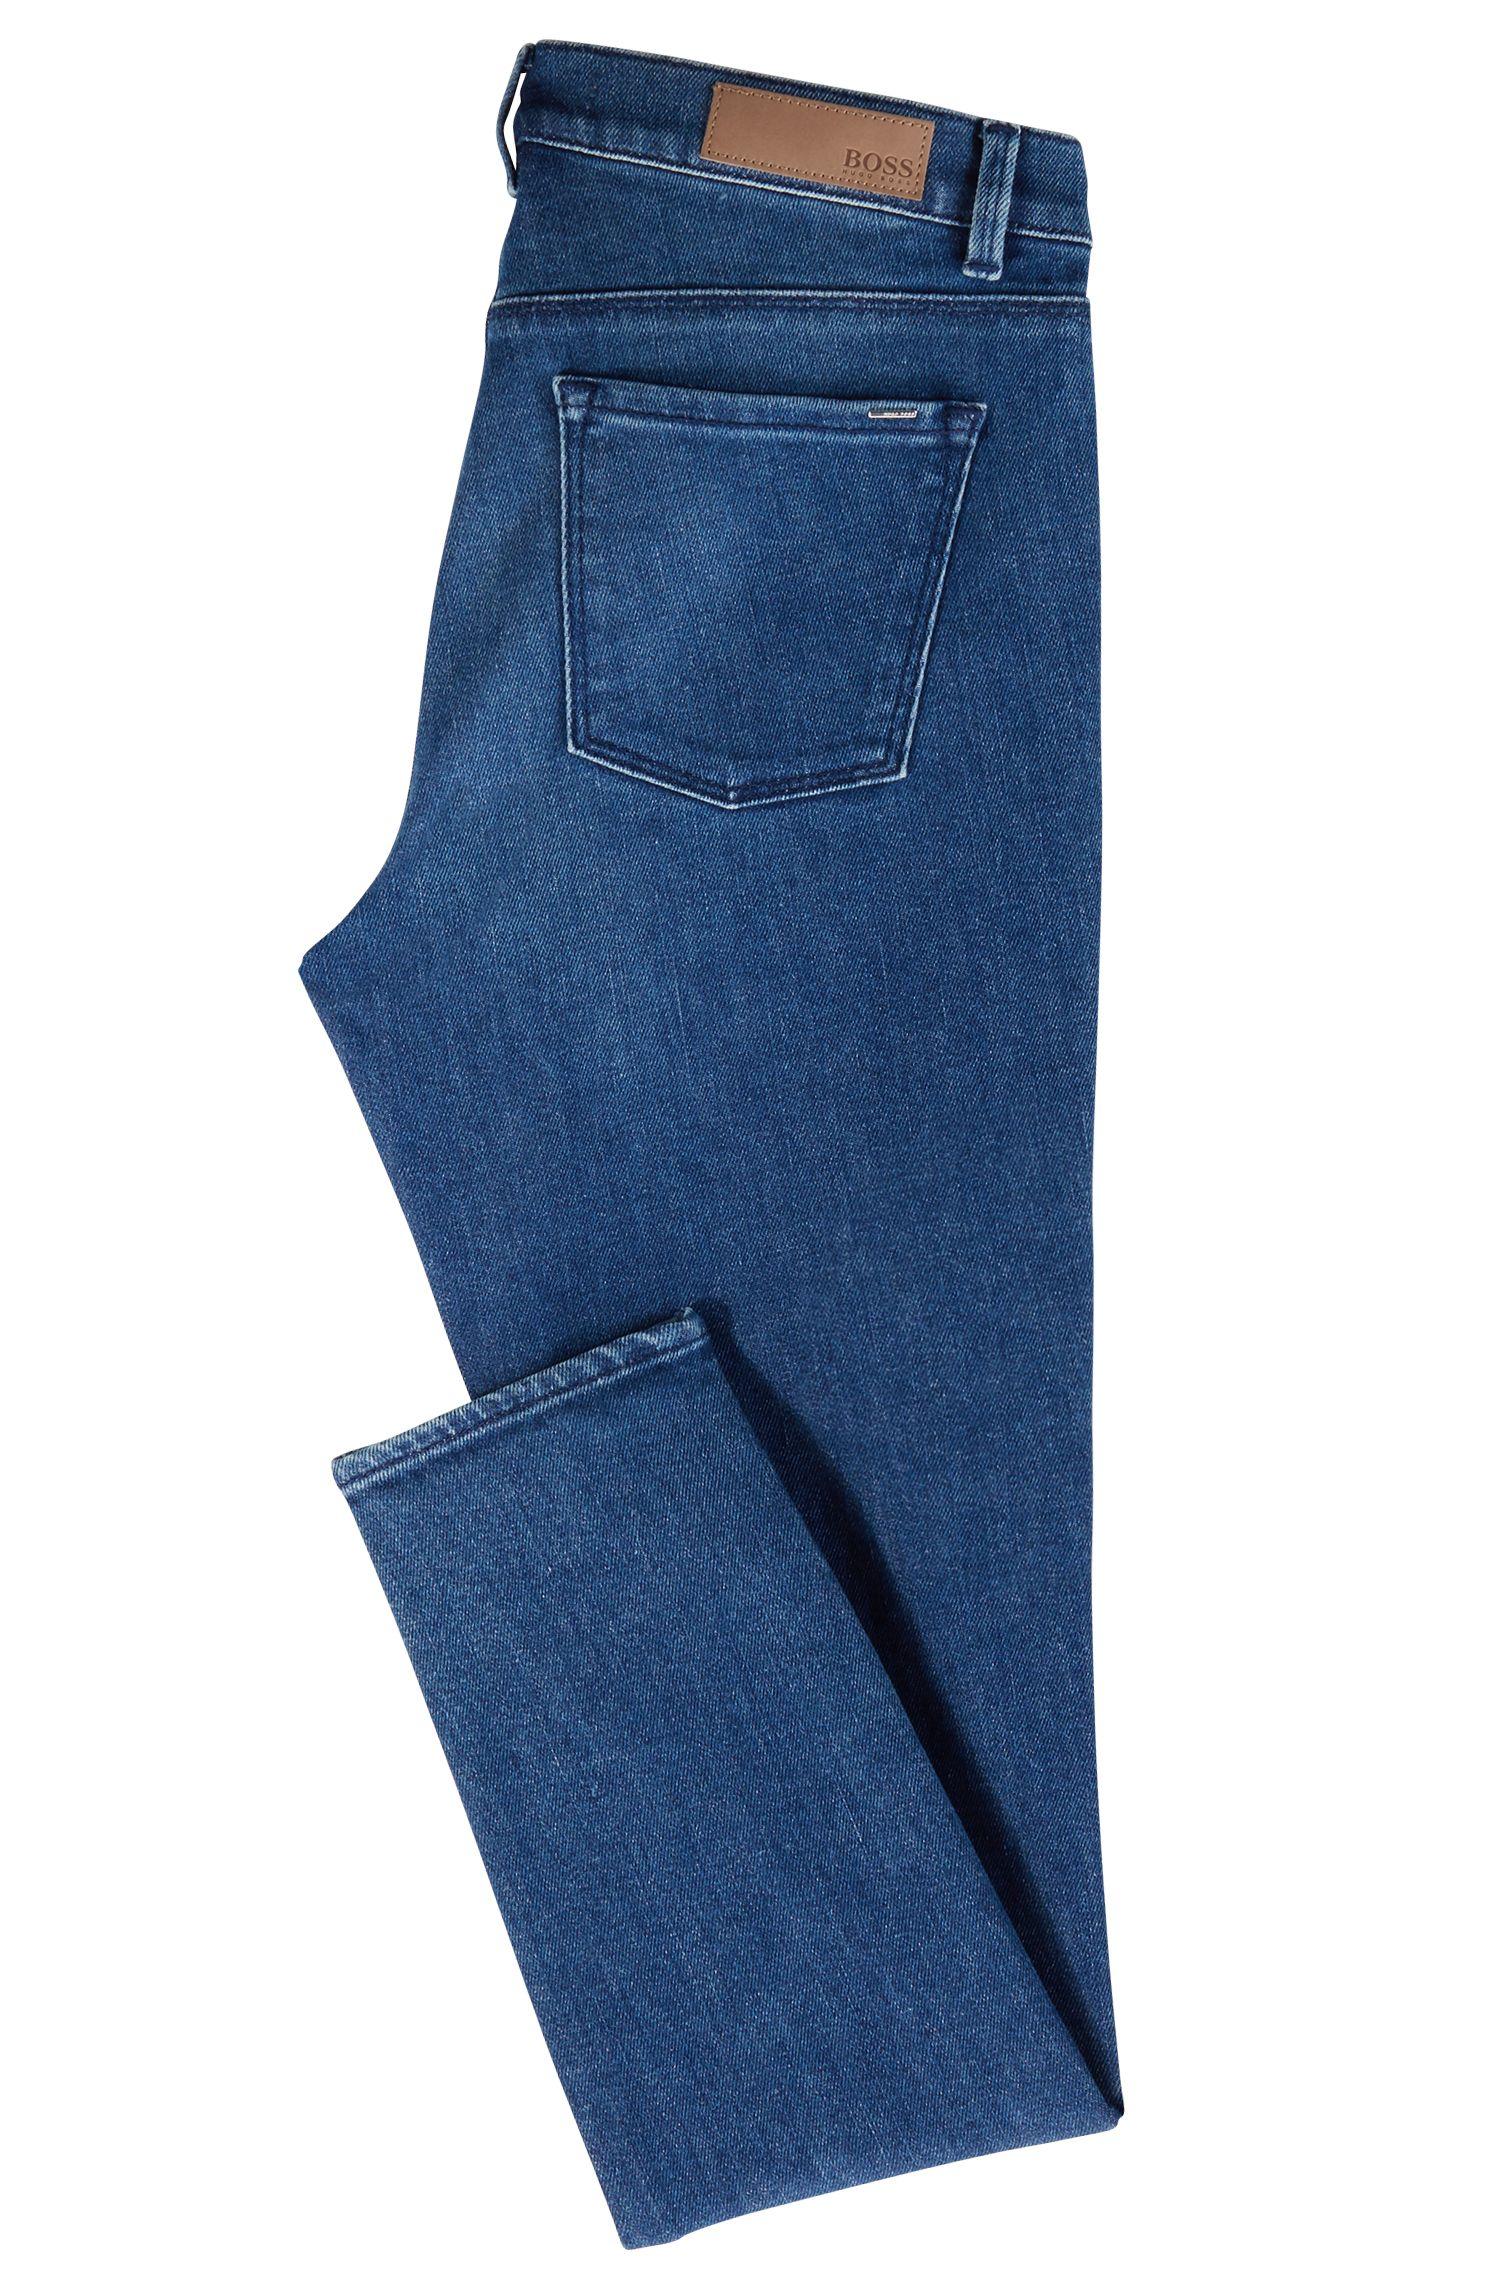 Hugo Boss - Skinny-Fit Jeans aus komfortablem Stretch-Denim - 5